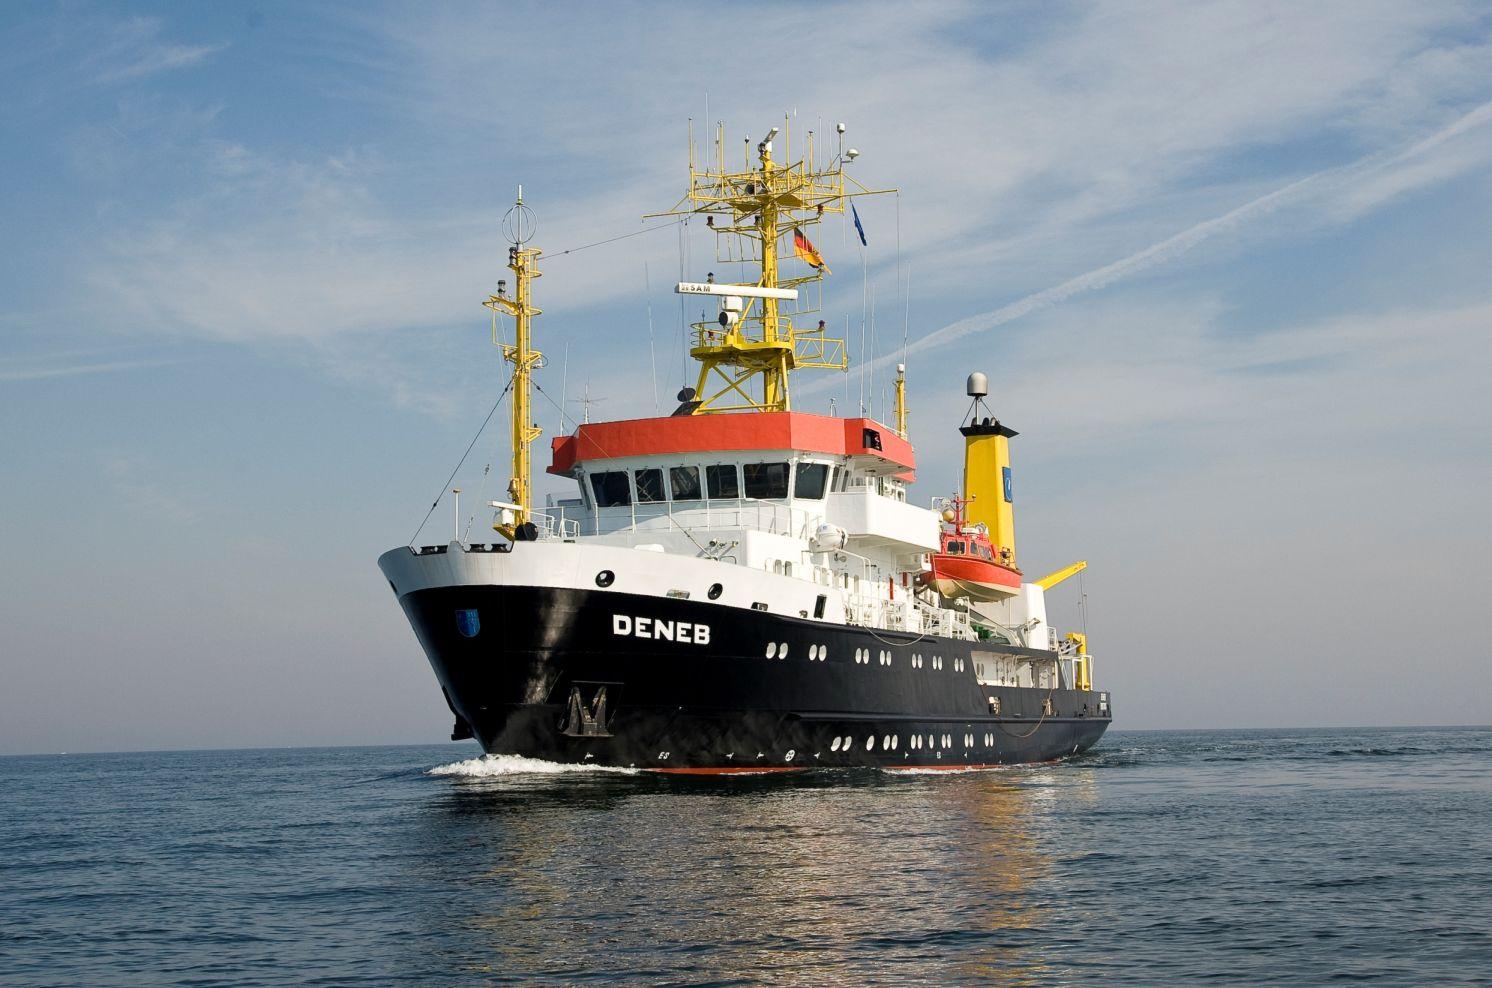 Forschungsschiff Deneb